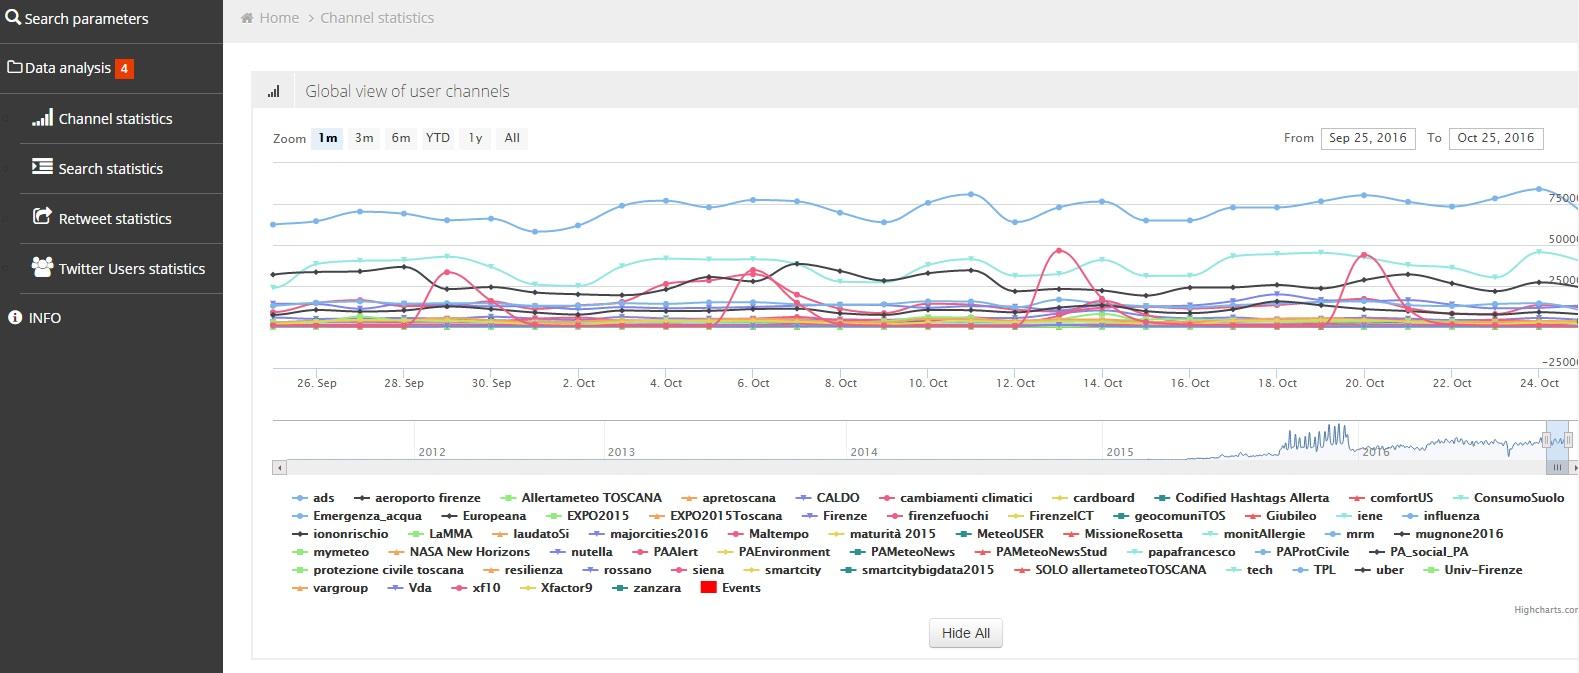 km4city-social-media-sentiment-analysis